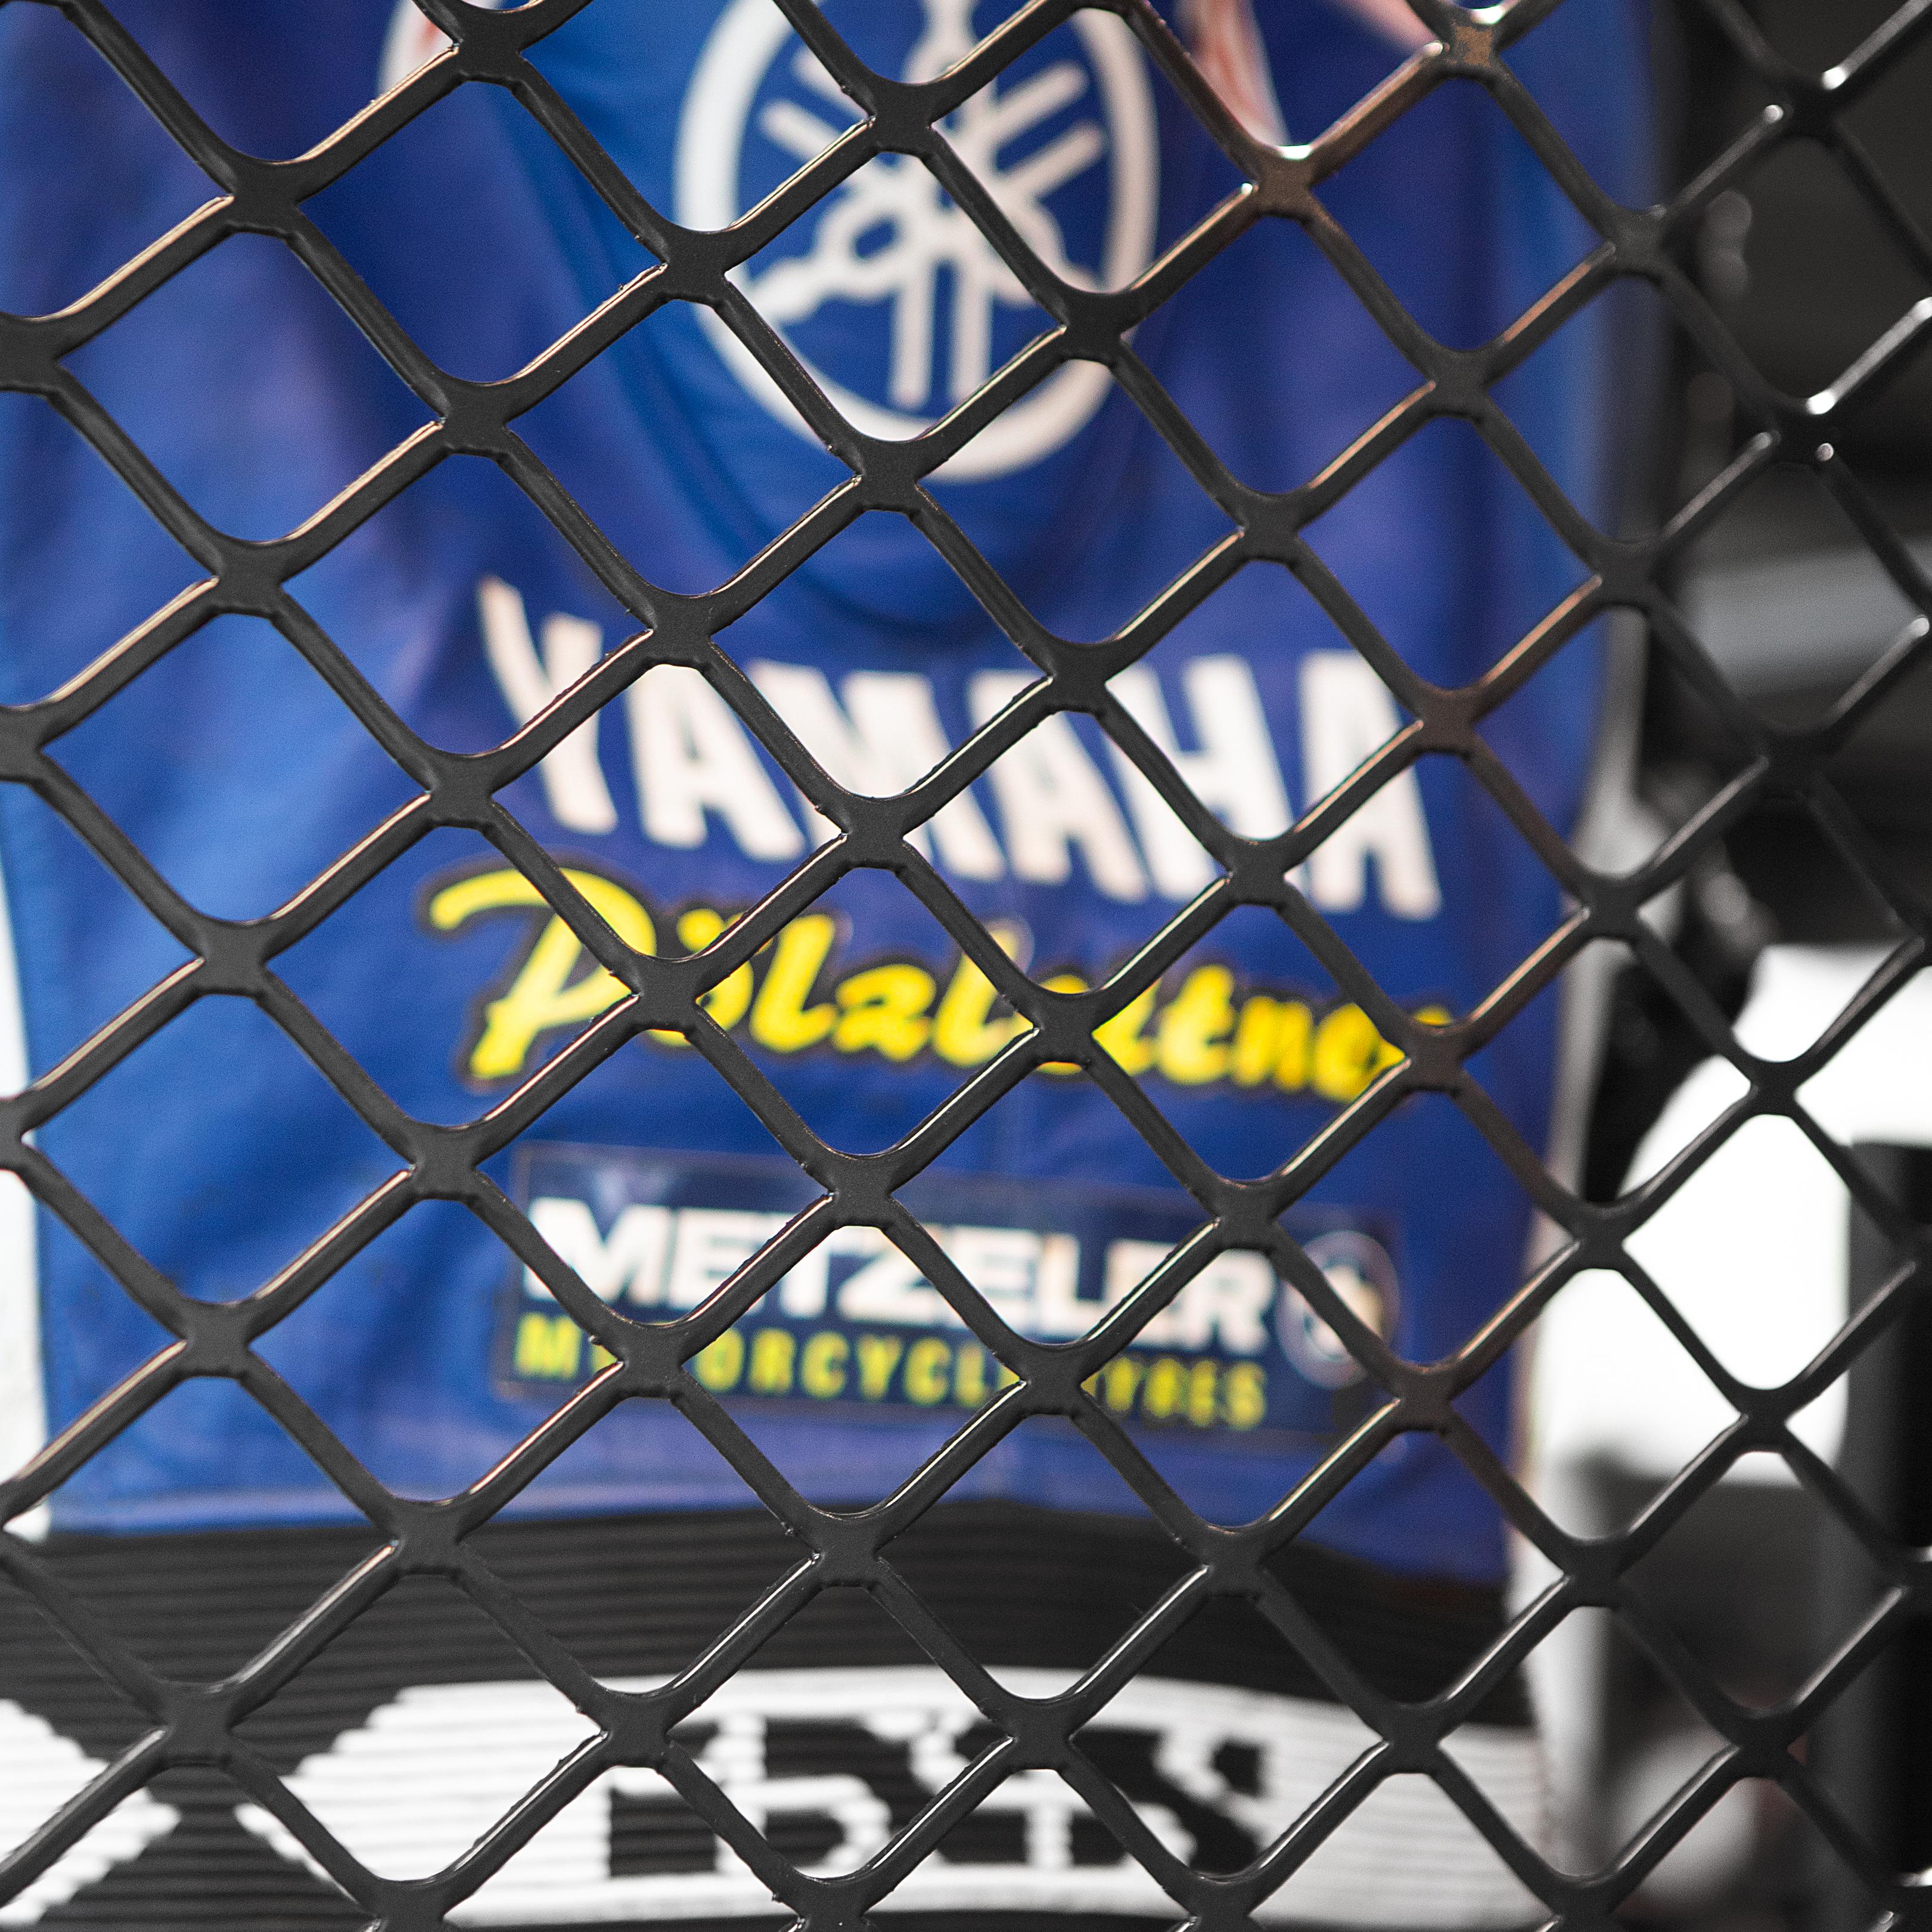 Hostettler Hall of Fame Metall Detail Yamaha